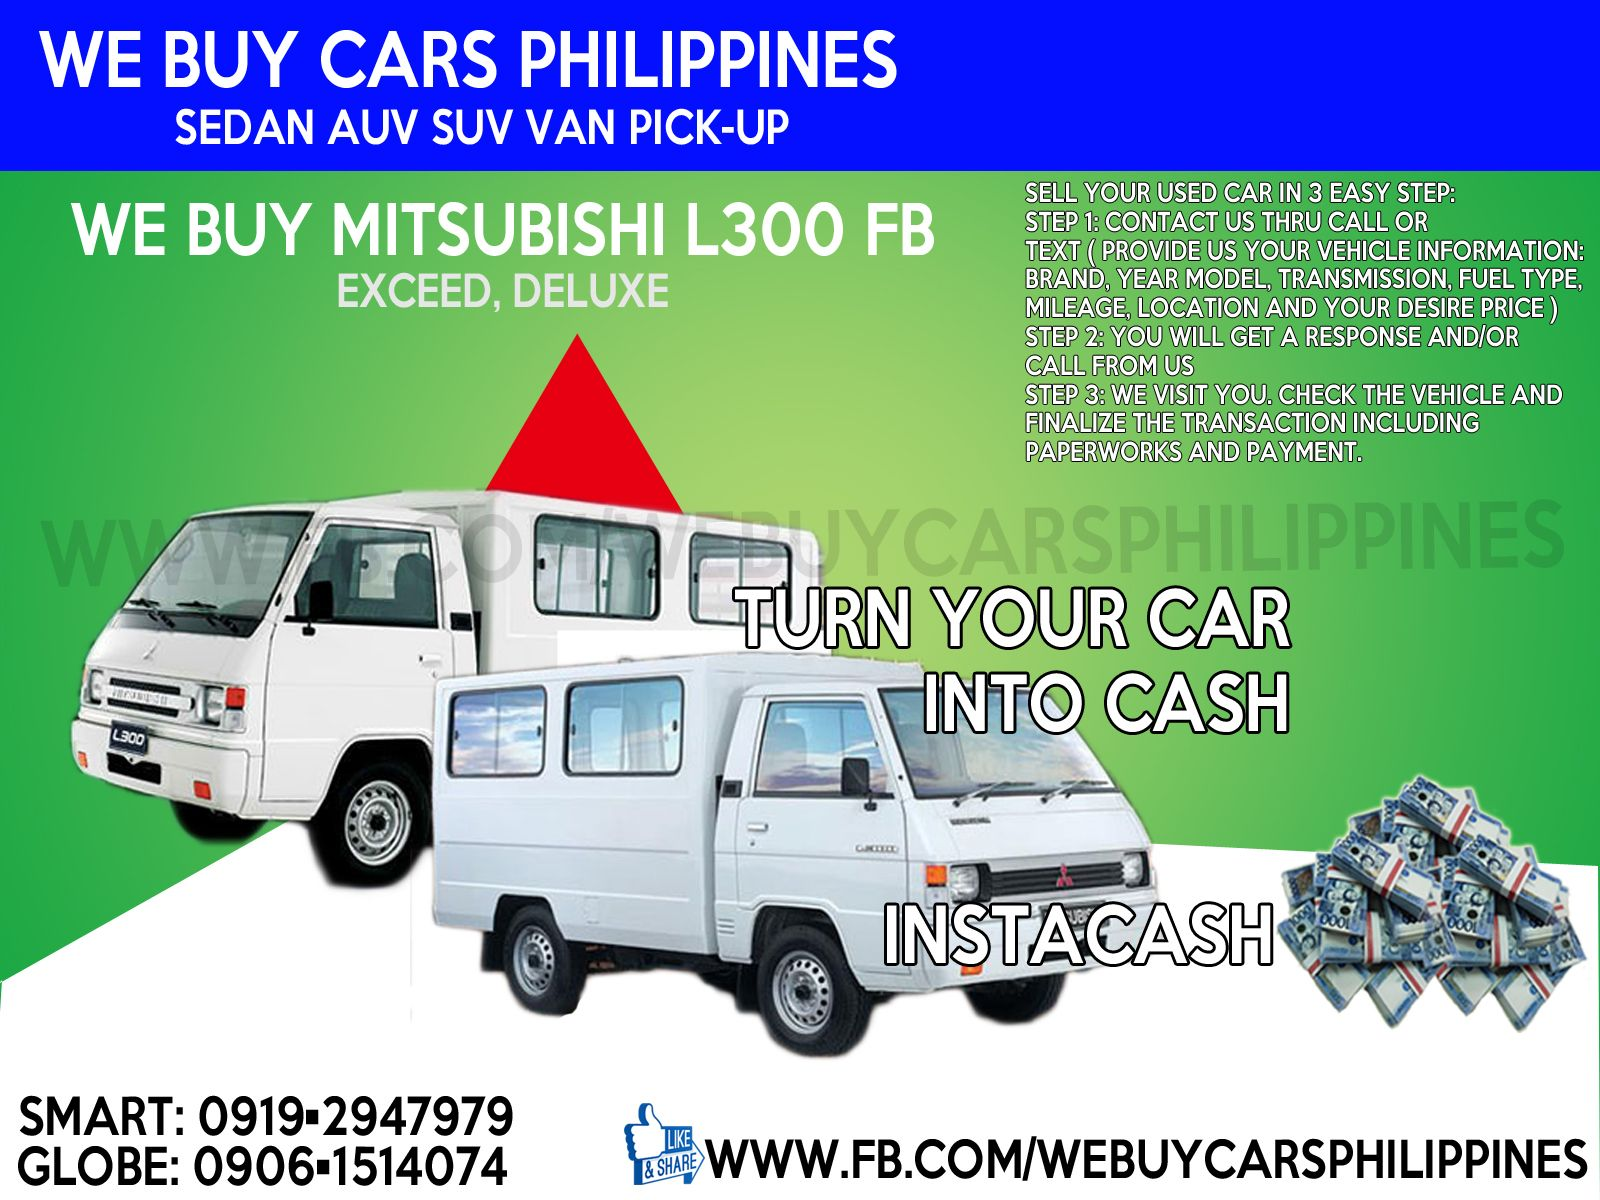 WE BUY USED MITSUBISHI L300 PHILIPPINES L300 CC w/ (Dealer Option ...